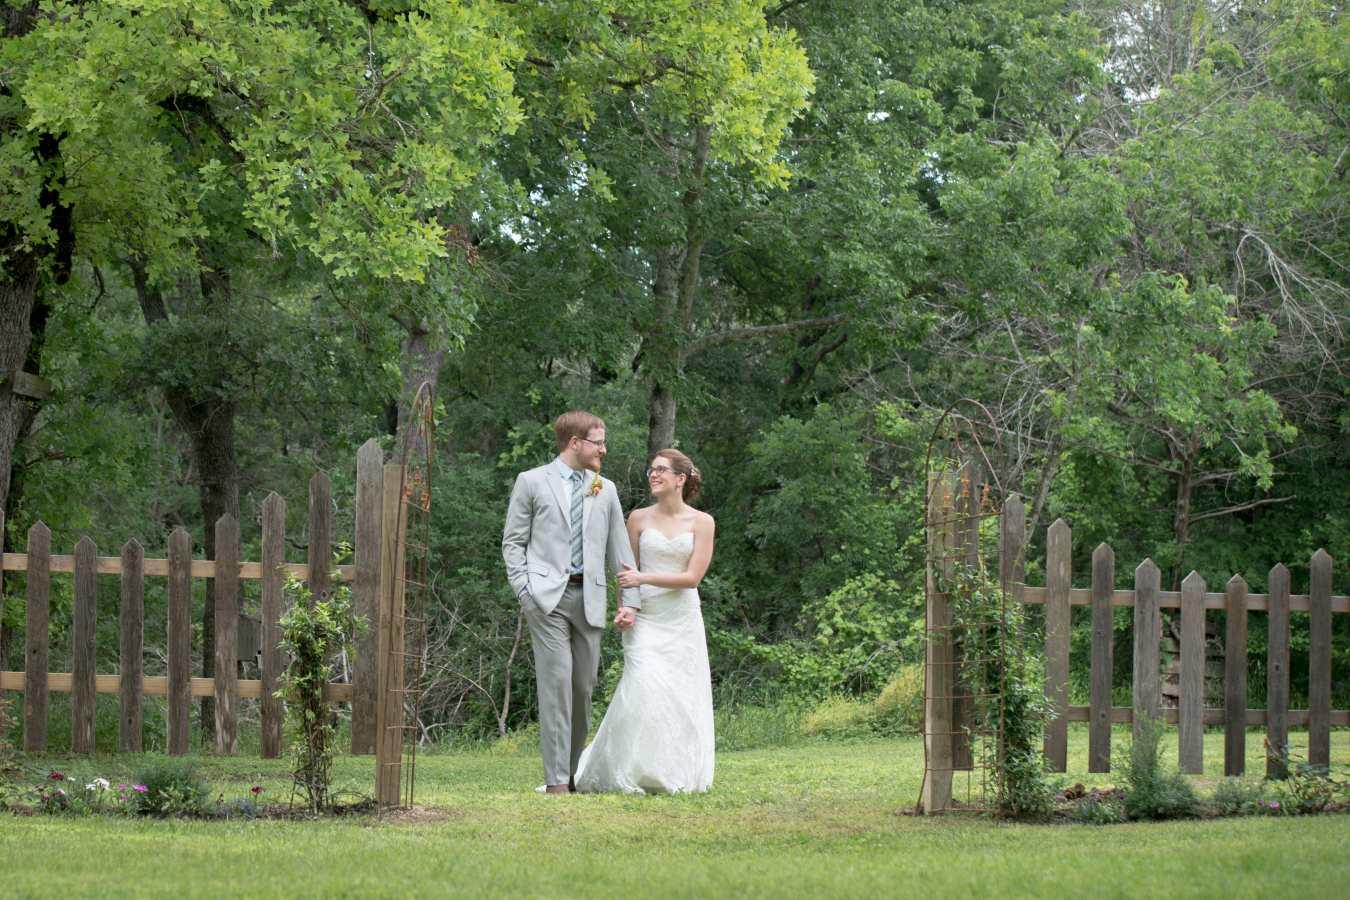 HighDot-Studios-Wedding-Cedar-Bend-Event-Center -Austin-Kim and Mike (42)